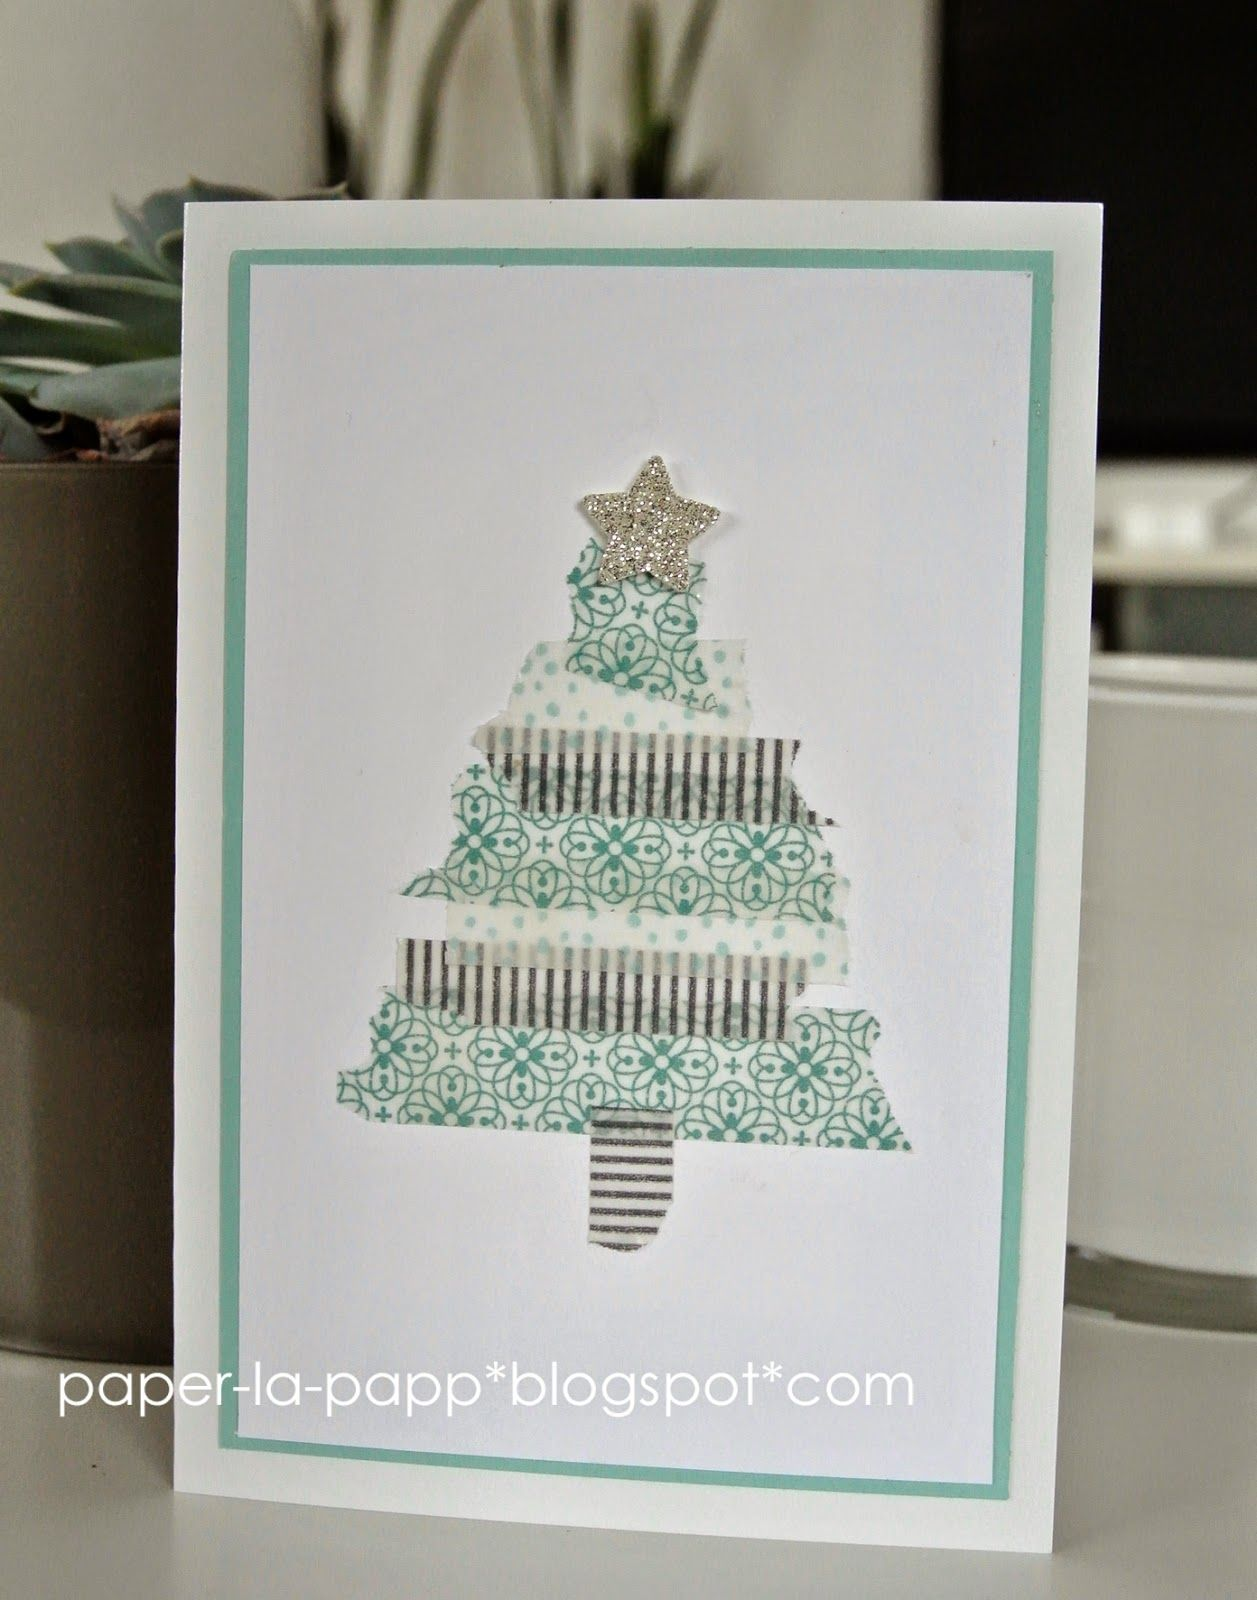 paper la papp stampin up demo in nrw christmas cards. Black Bedroom Furniture Sets. Home Design Ideas